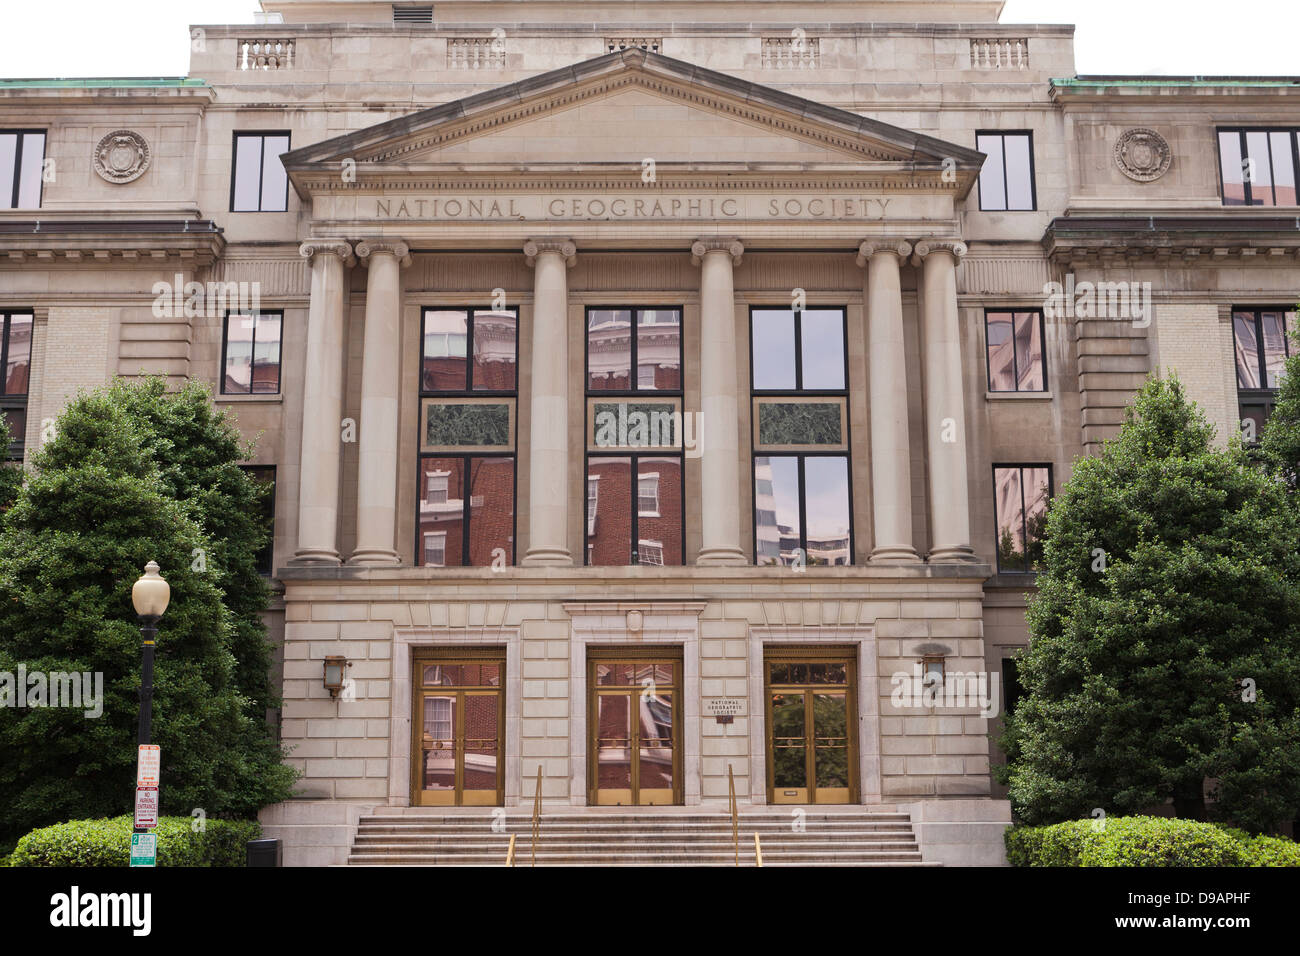 The National Geographic Society  Administration building, Washington DC USA - Stock Image